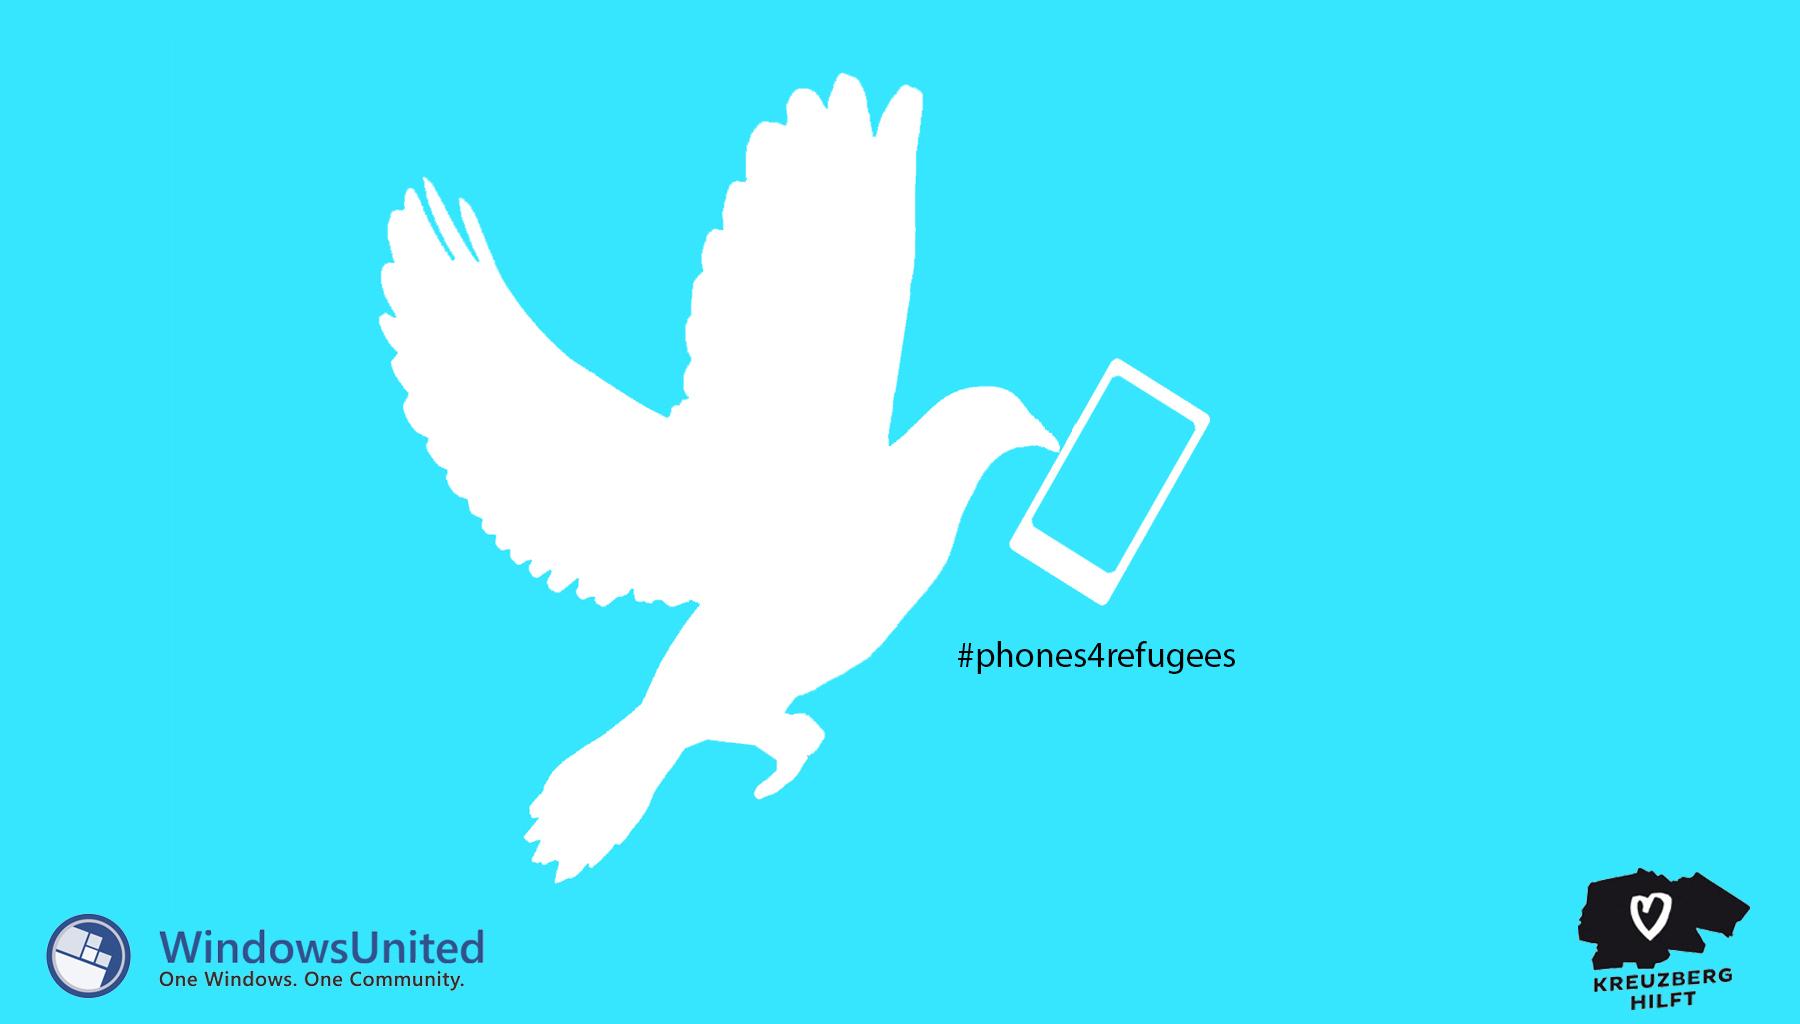 phonesforrefugees-logo